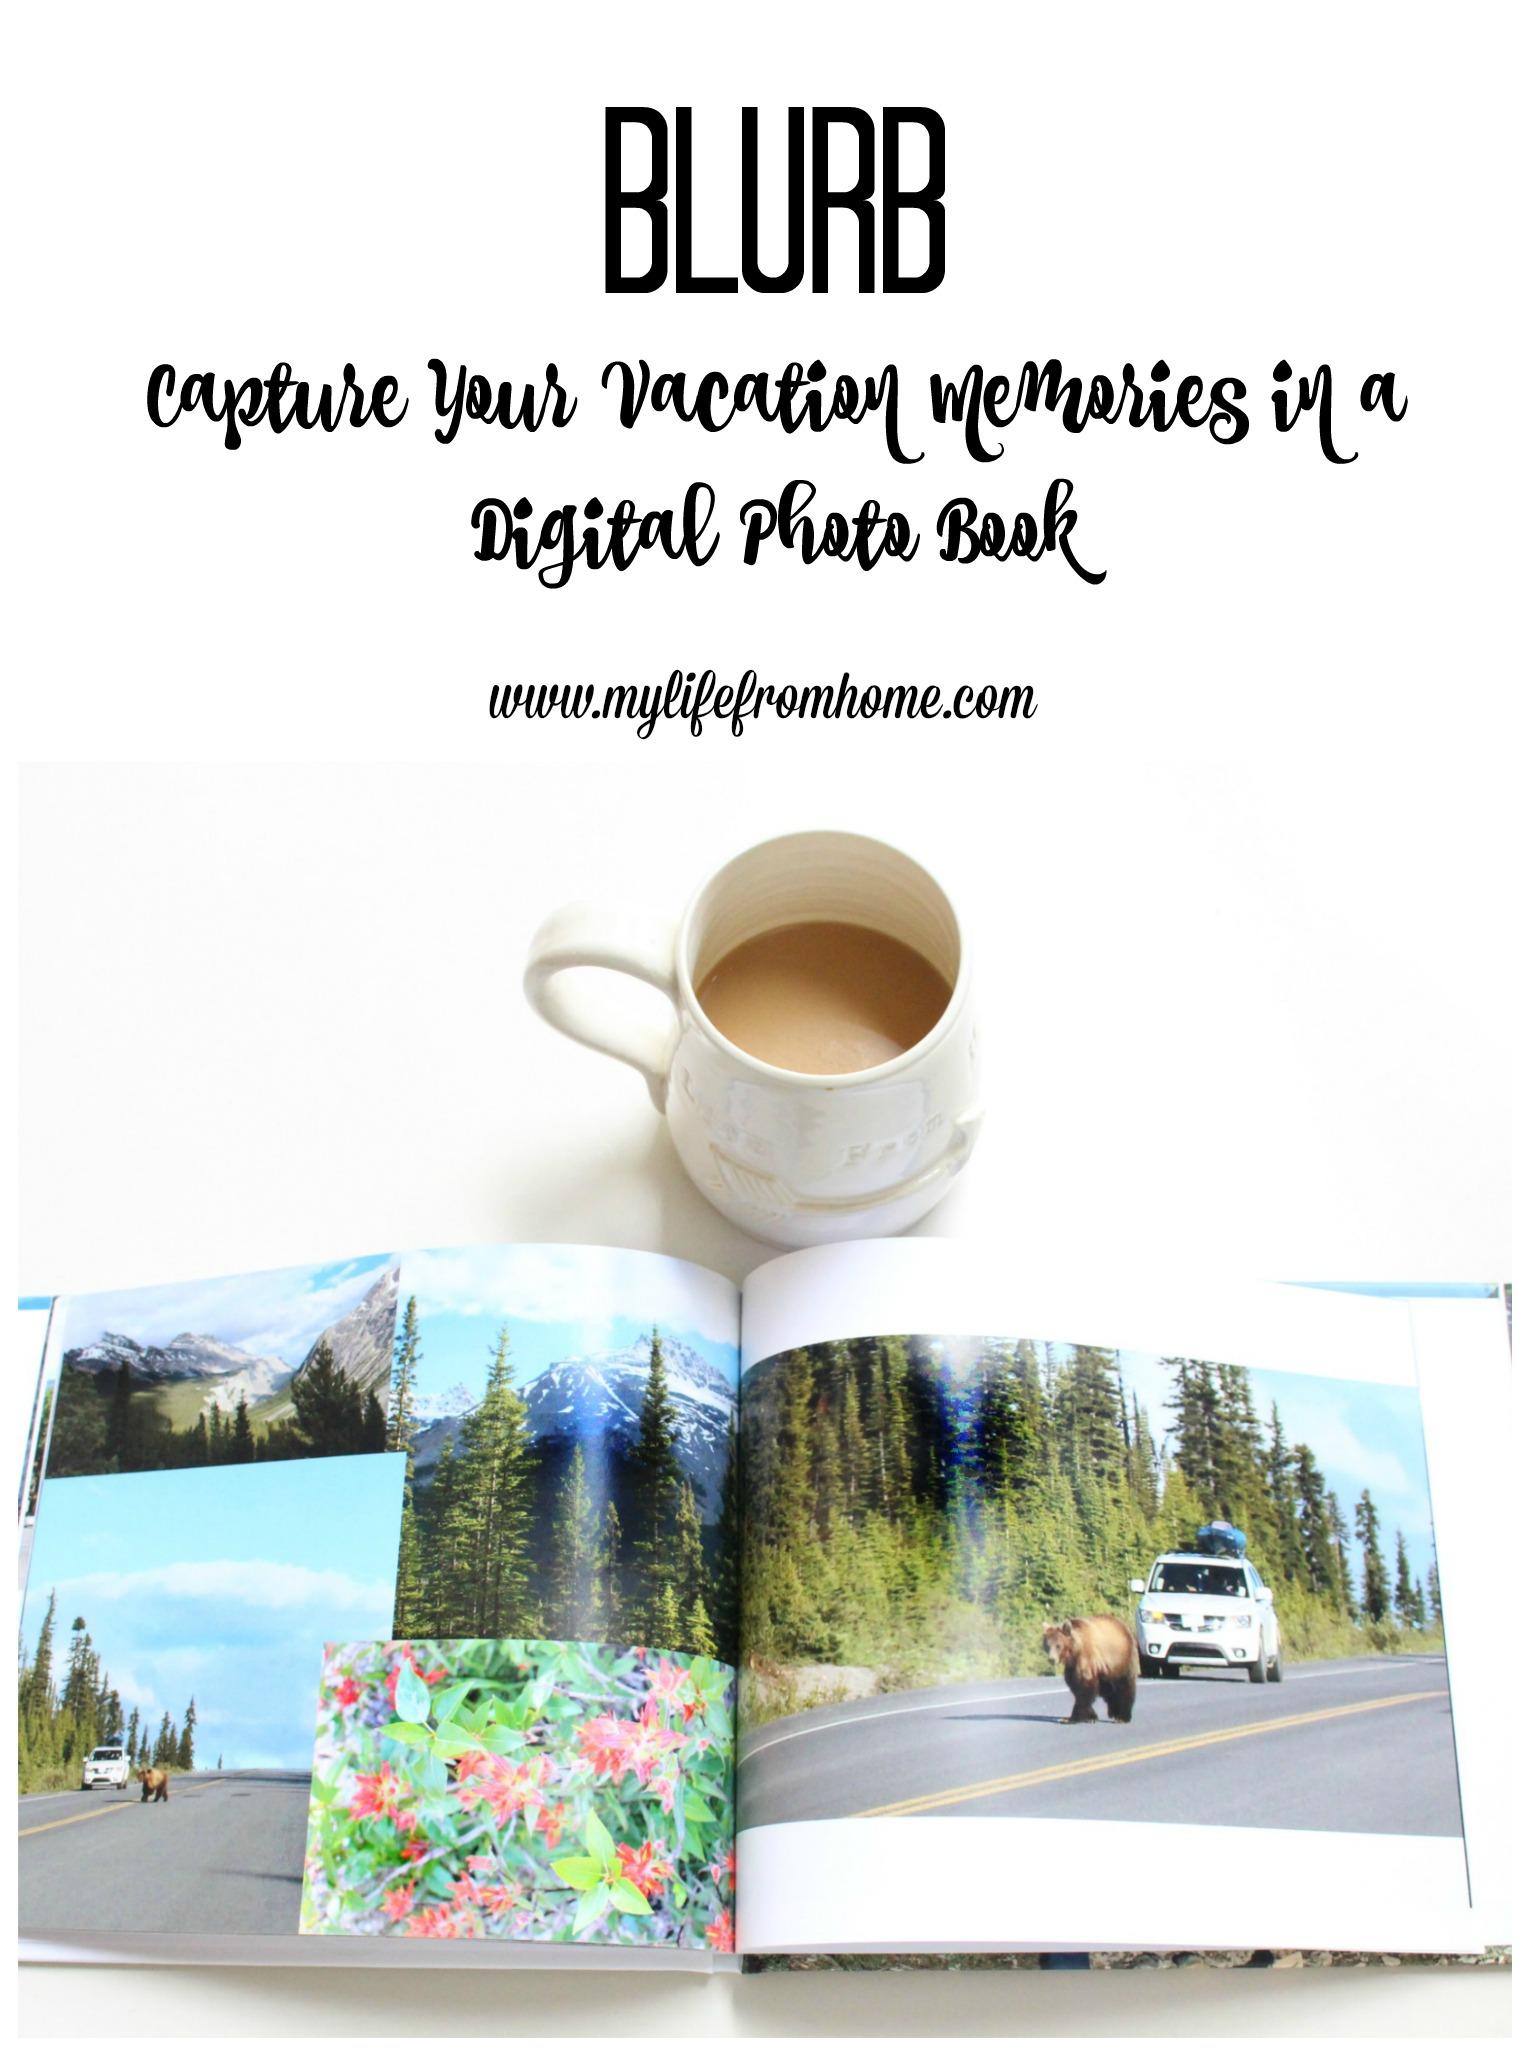 Blurb- Blurb self- publishing- photo books- digital books- how to make a digital book- vacation memories- books